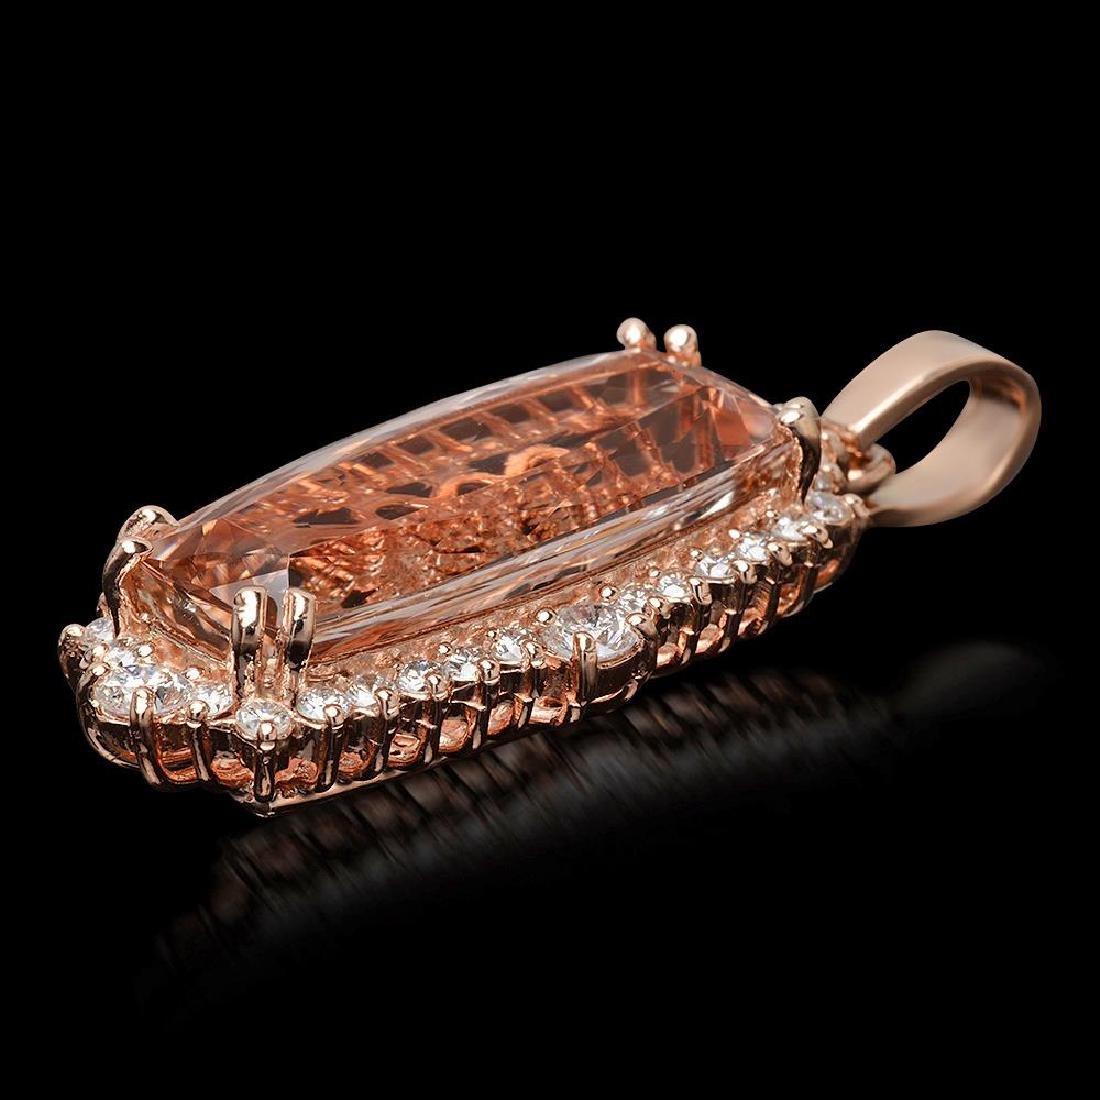 14K Gold 12.37ct Morganite 1.25ct Diamond Pendant - 2